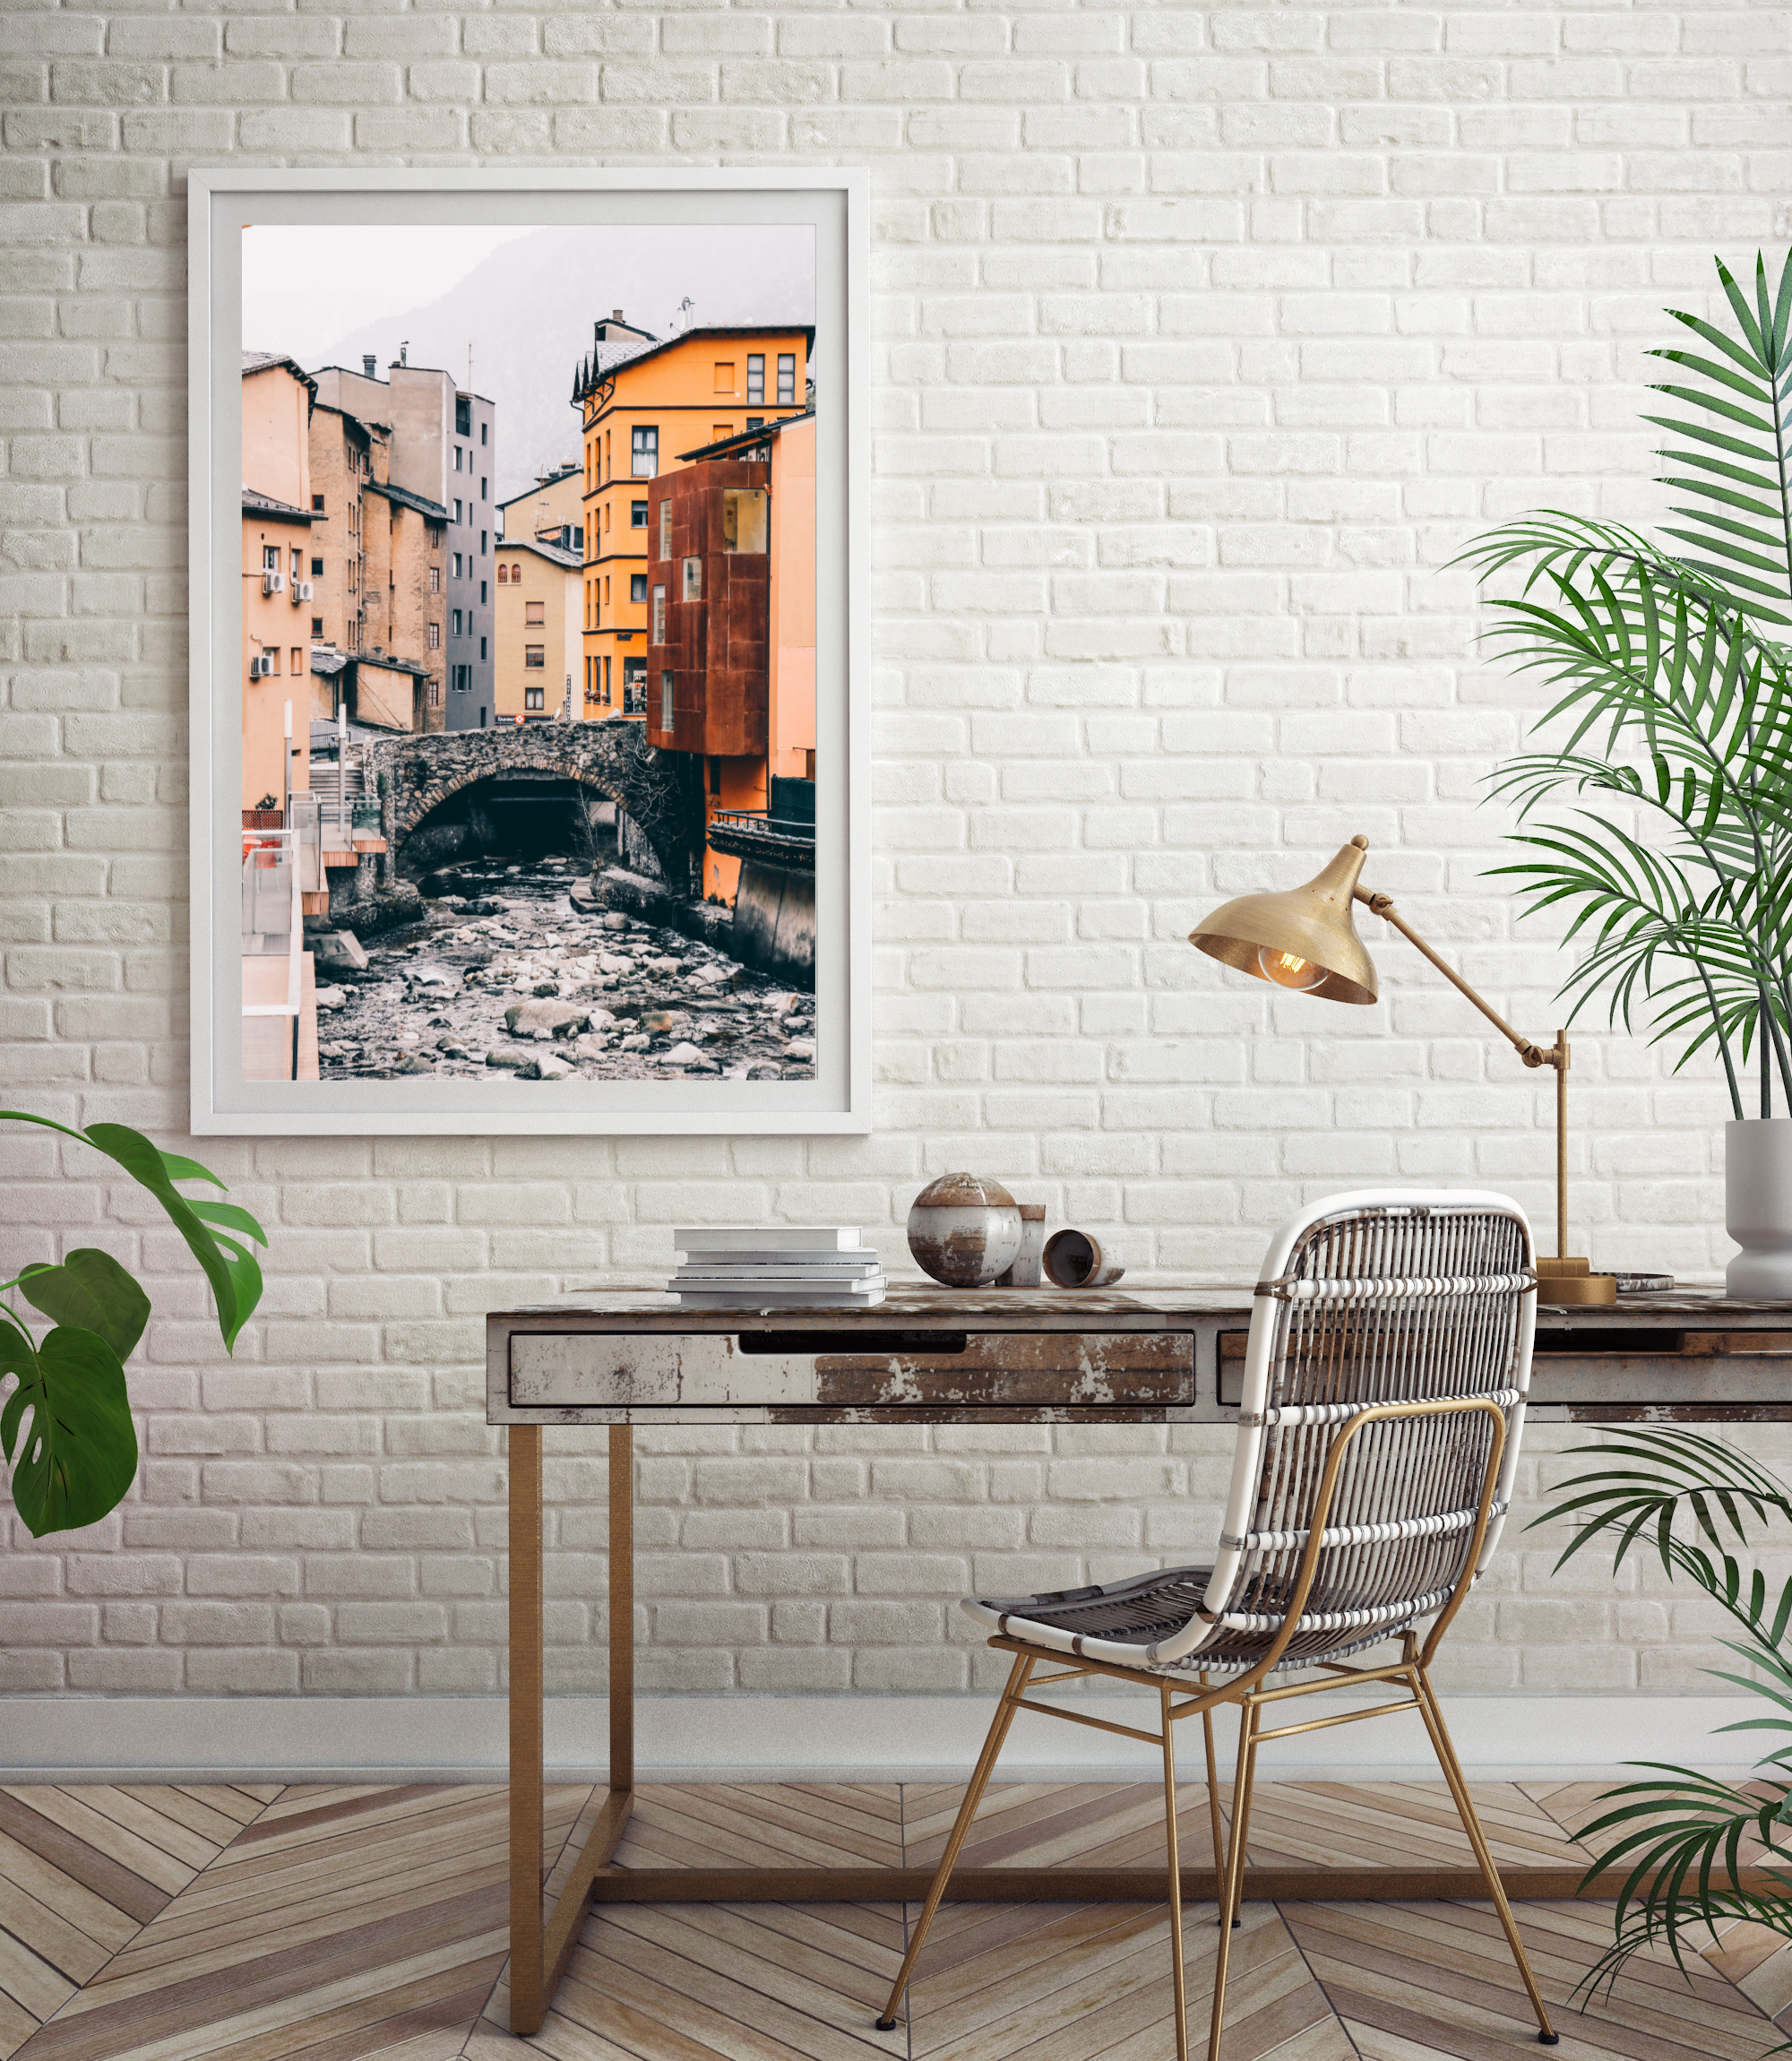 Andorra buildings print